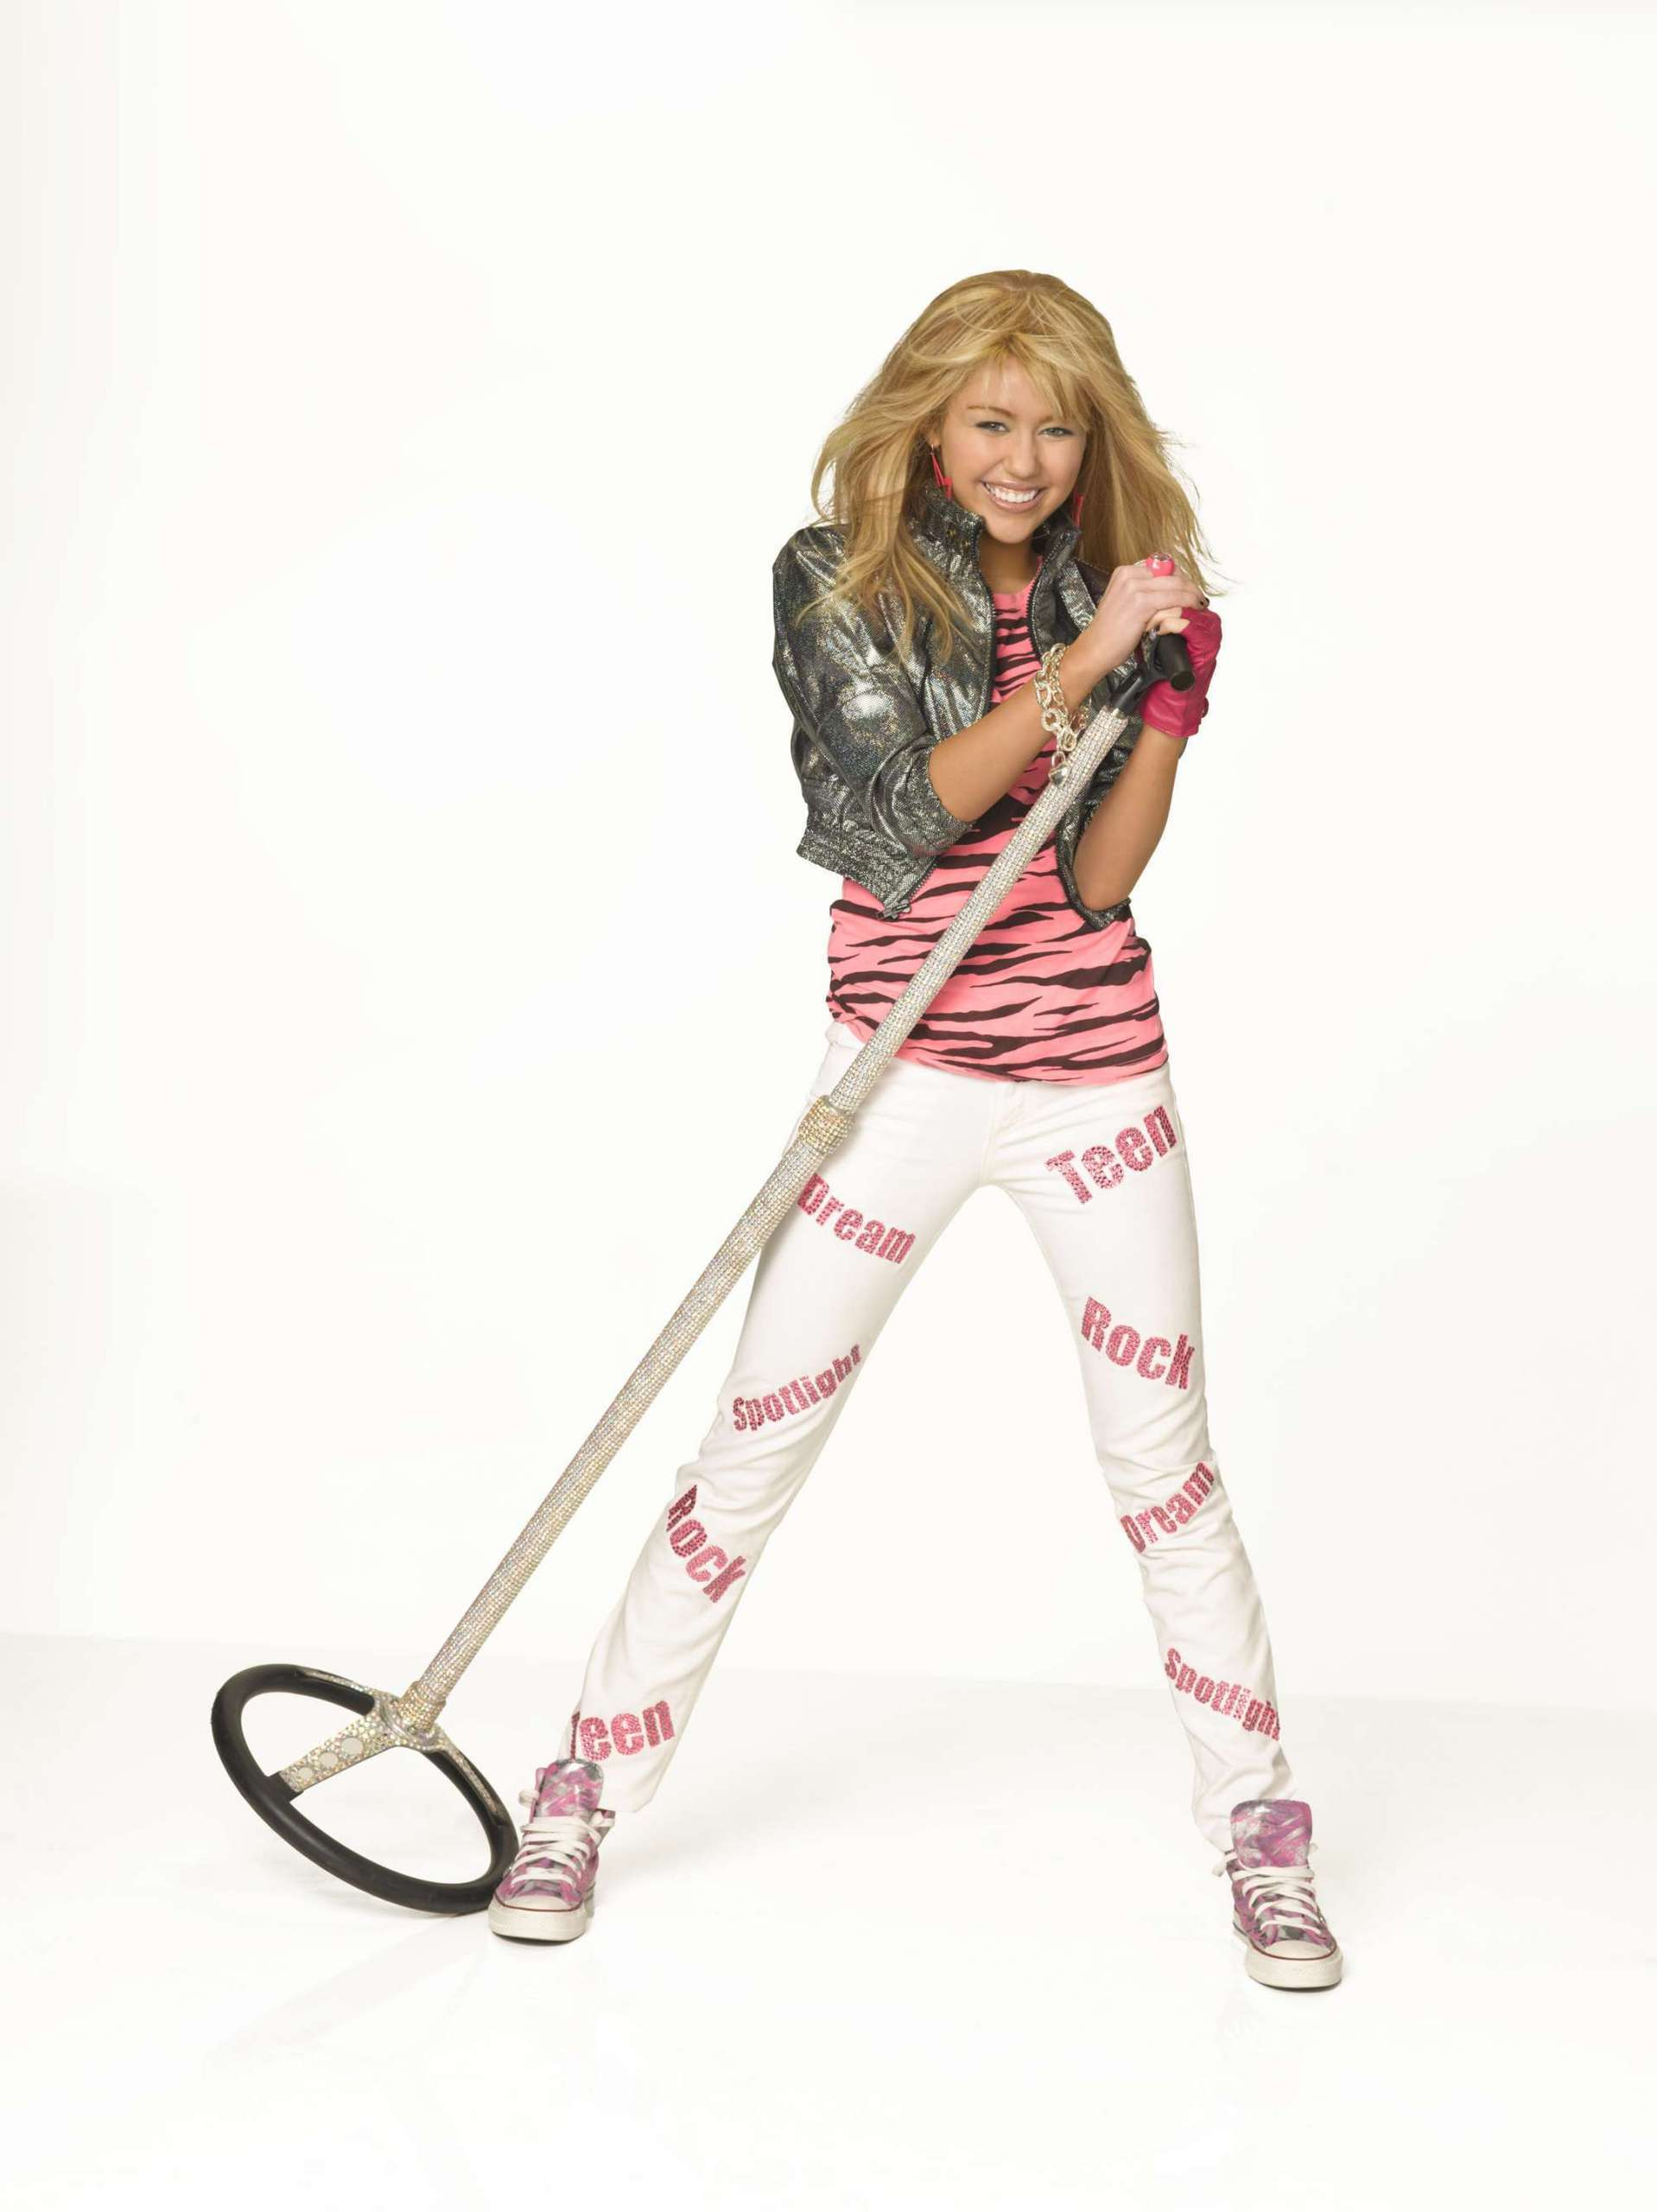 صور هانا مونتنا Hannah-Montana-S3-Promos-hannah-montana-2787384-1918-2560